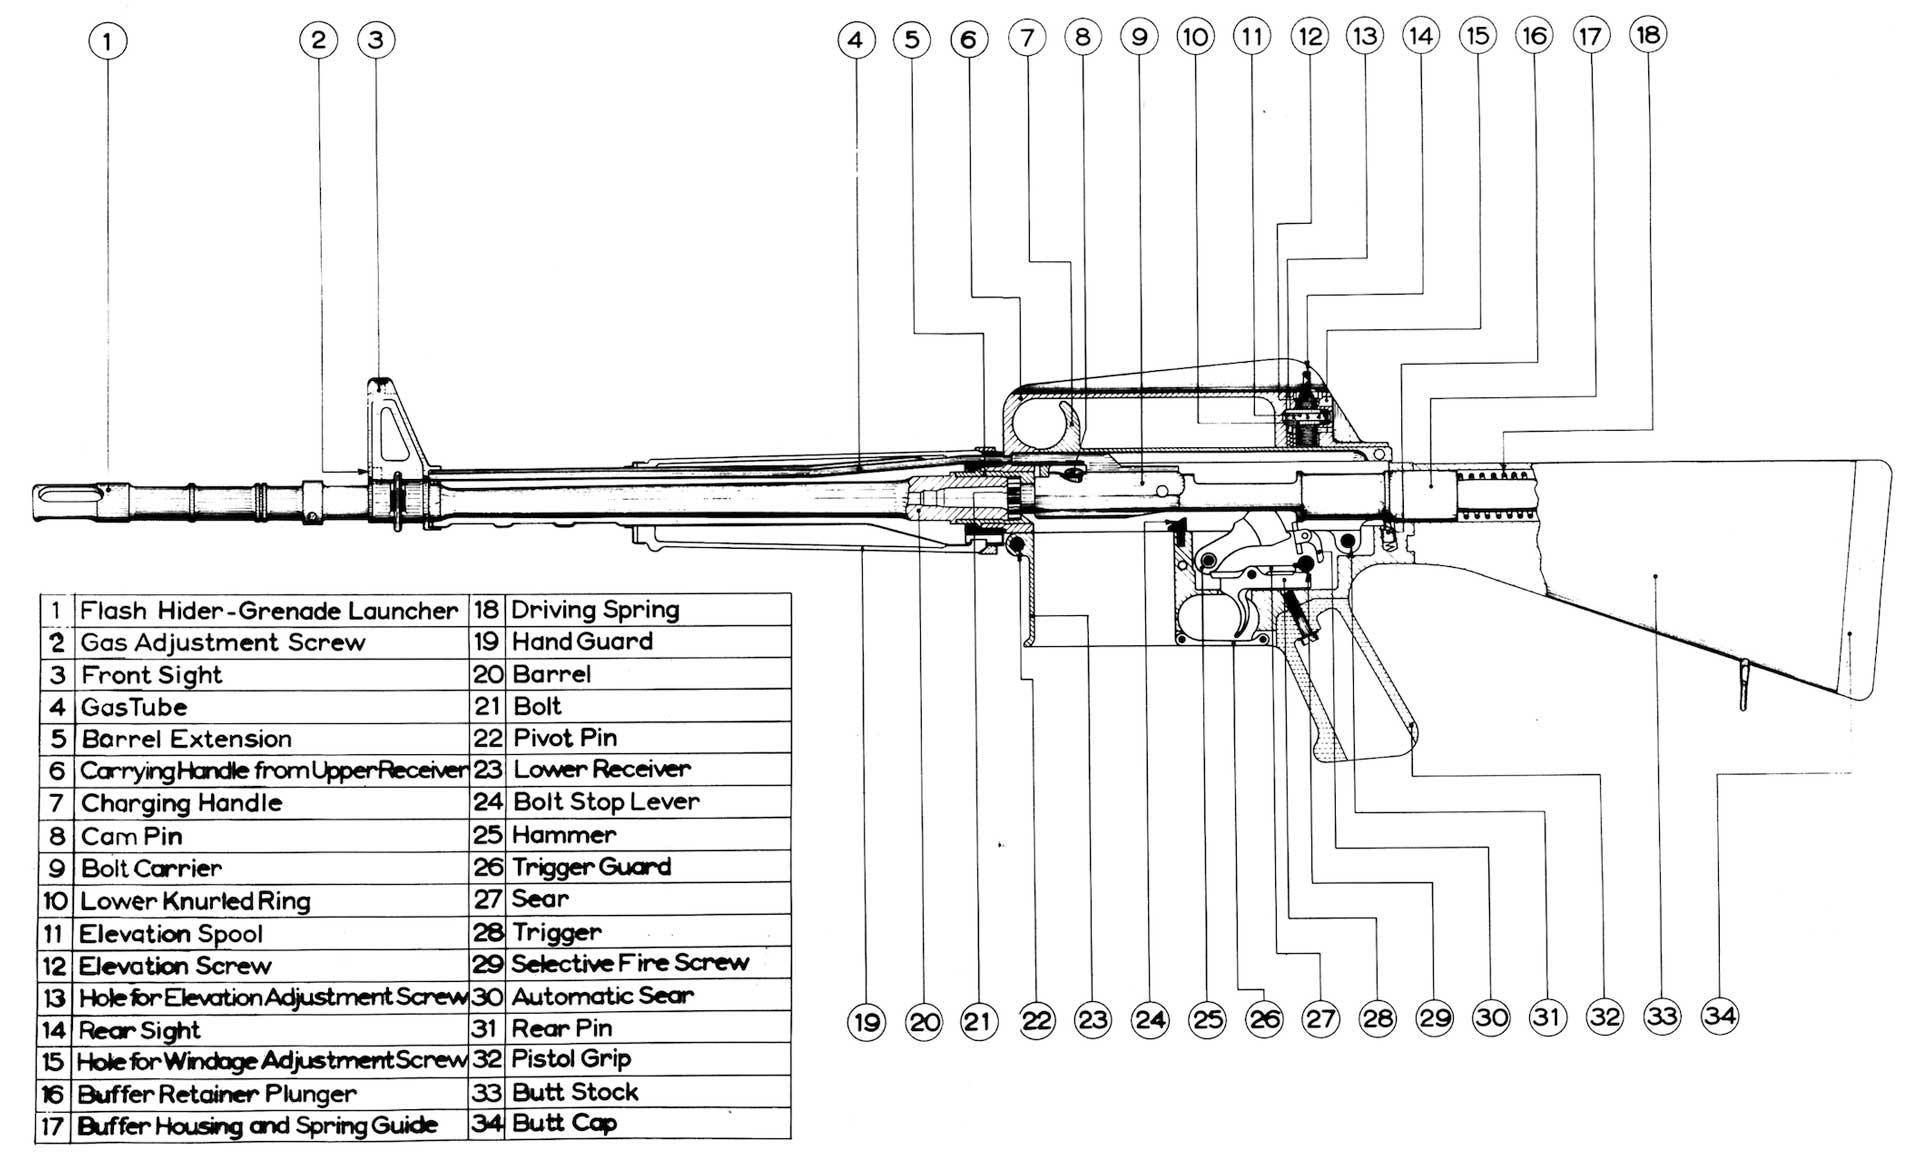 drawing black white gun rifle parts callouts descriptions schematic